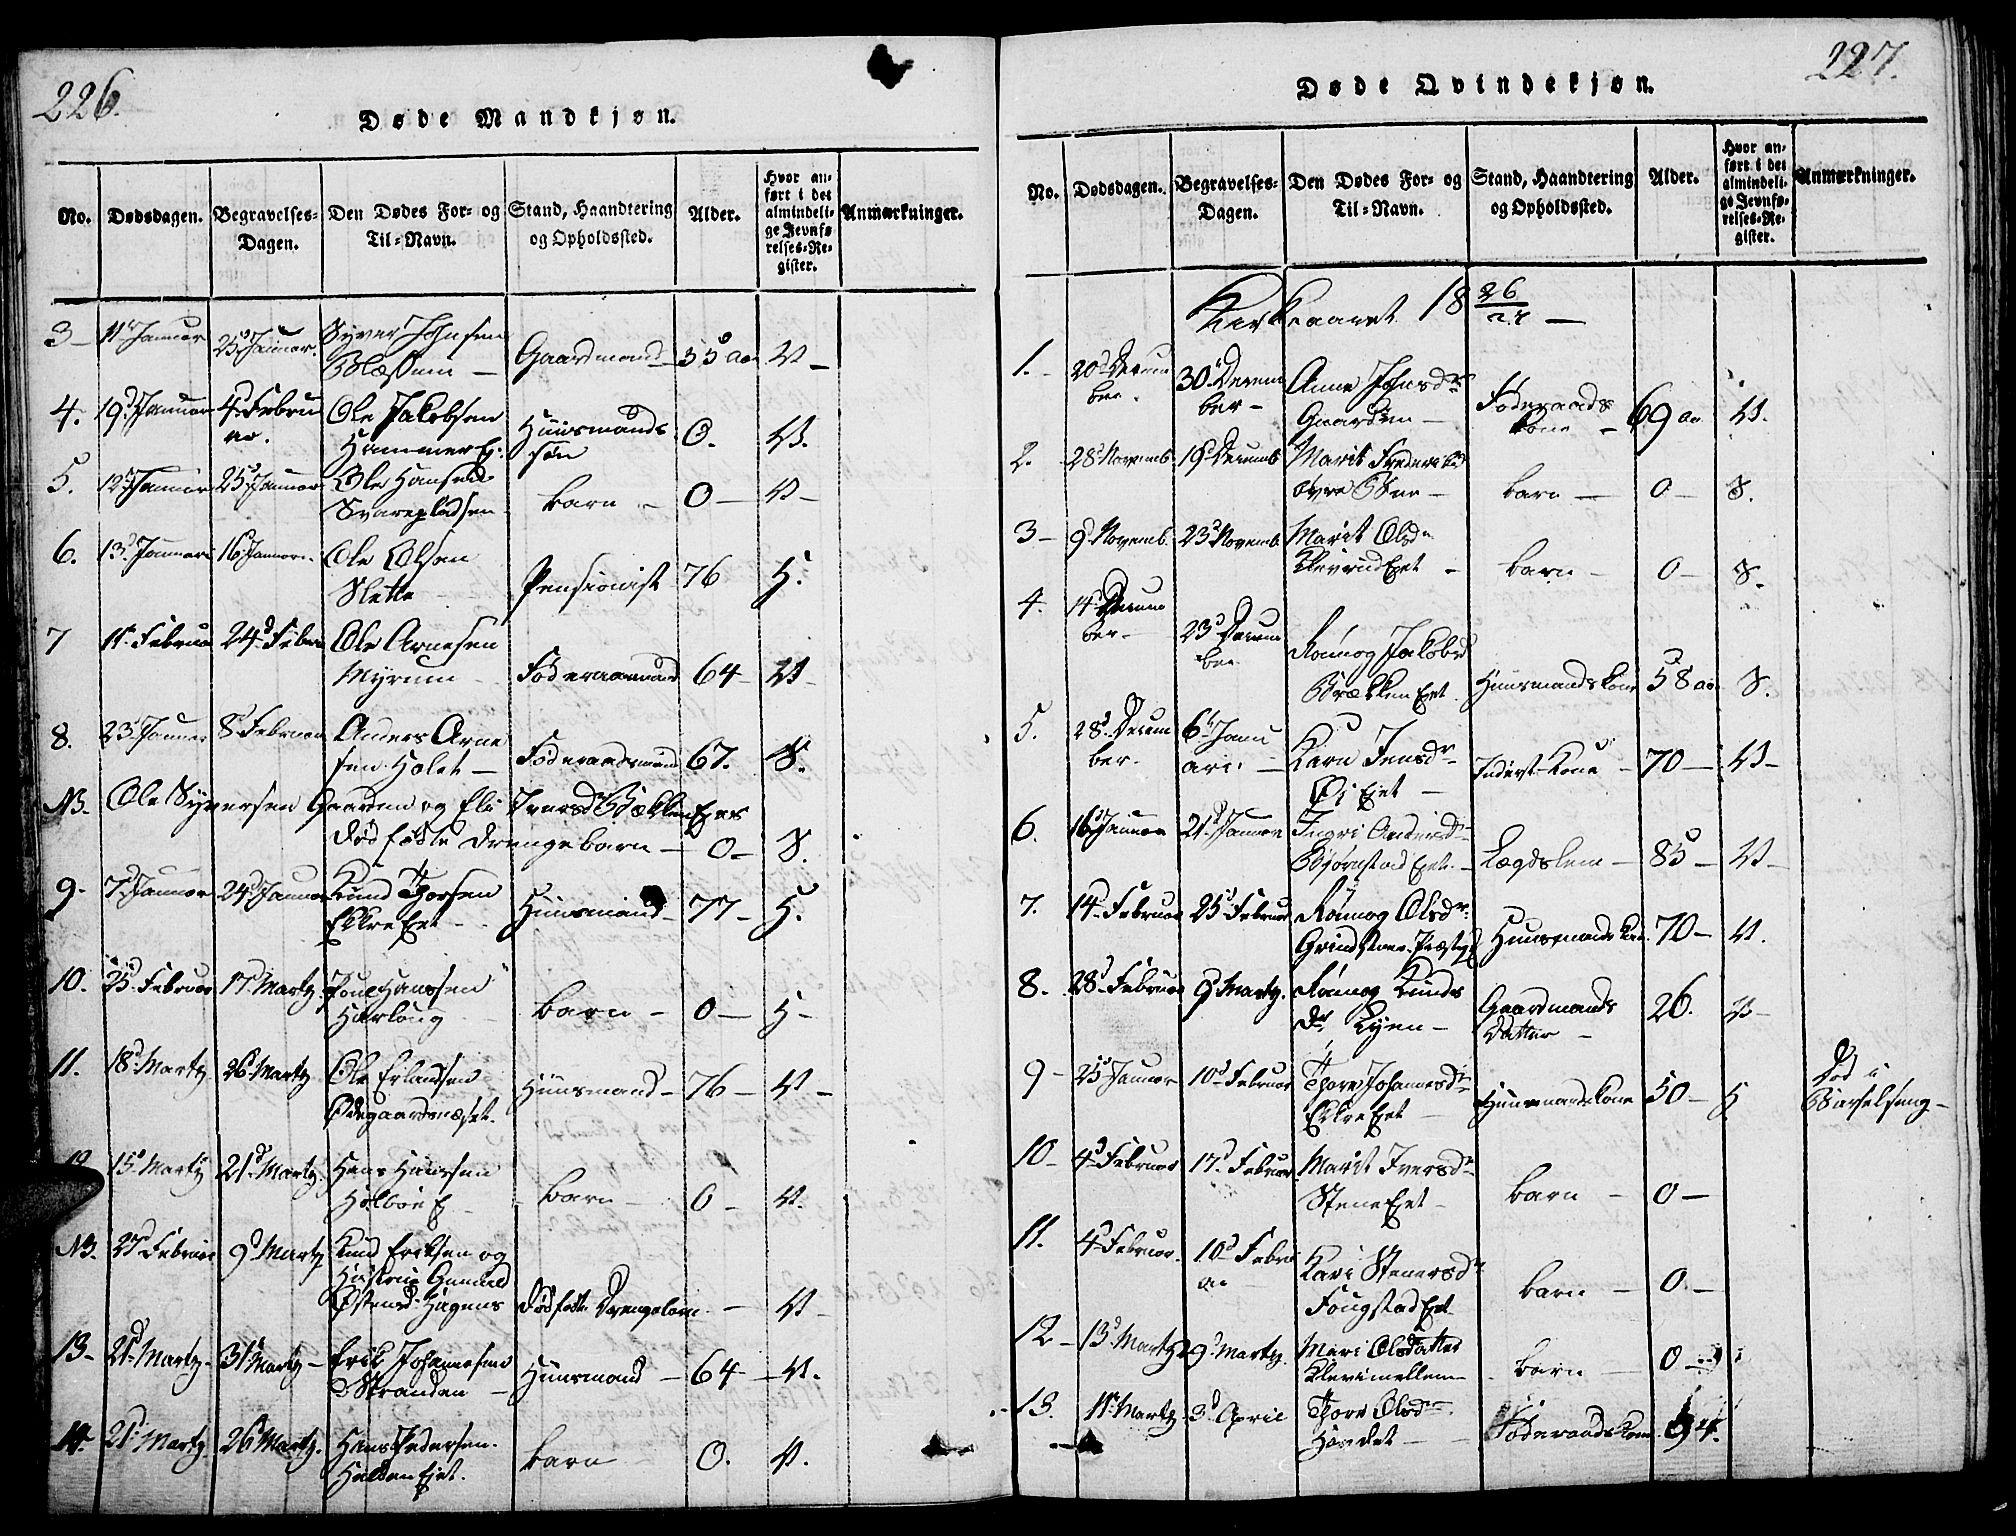 SAH, Vågå prestekontor, Ministerialbok nr. 3, 1815-1827, s. 226-227